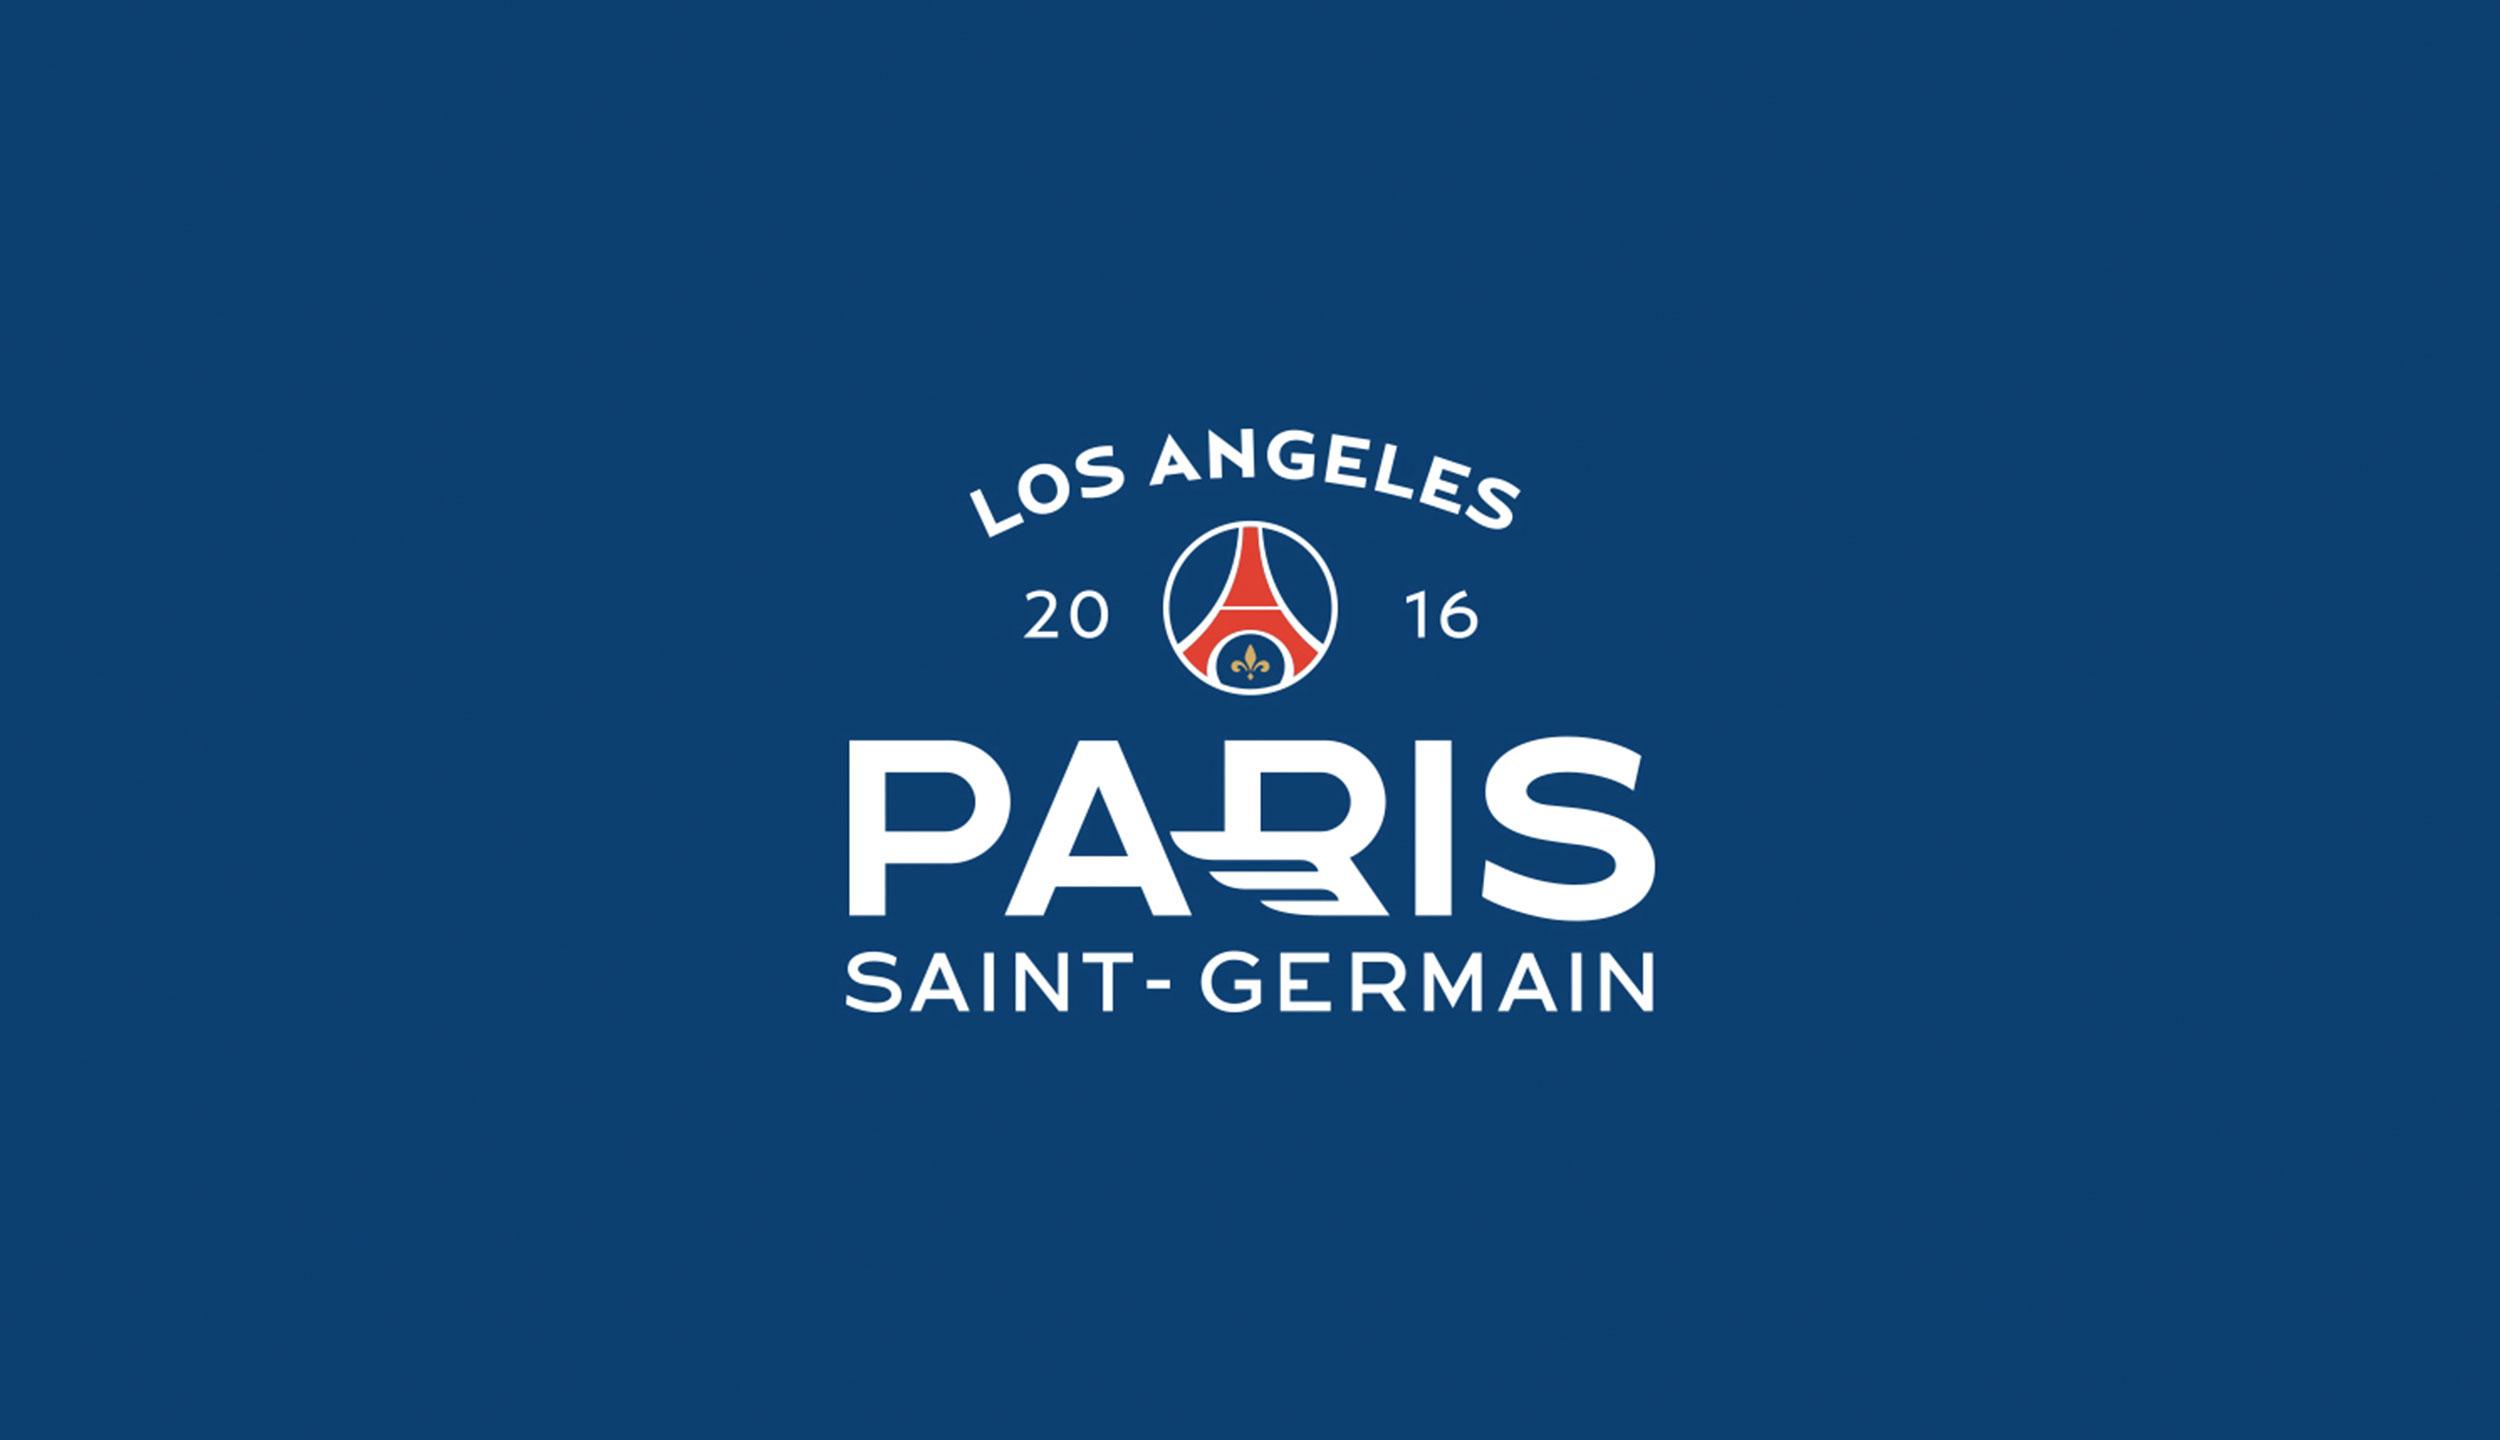 AntonioBrasko-Paris-Saint-Germain-LaGalerie-PopUp--TheSeventhLetter-ArtGallery-LosAngeles-Art-Design-SprayPaint-Boombox-Soccer-Nike-PSG.jpg